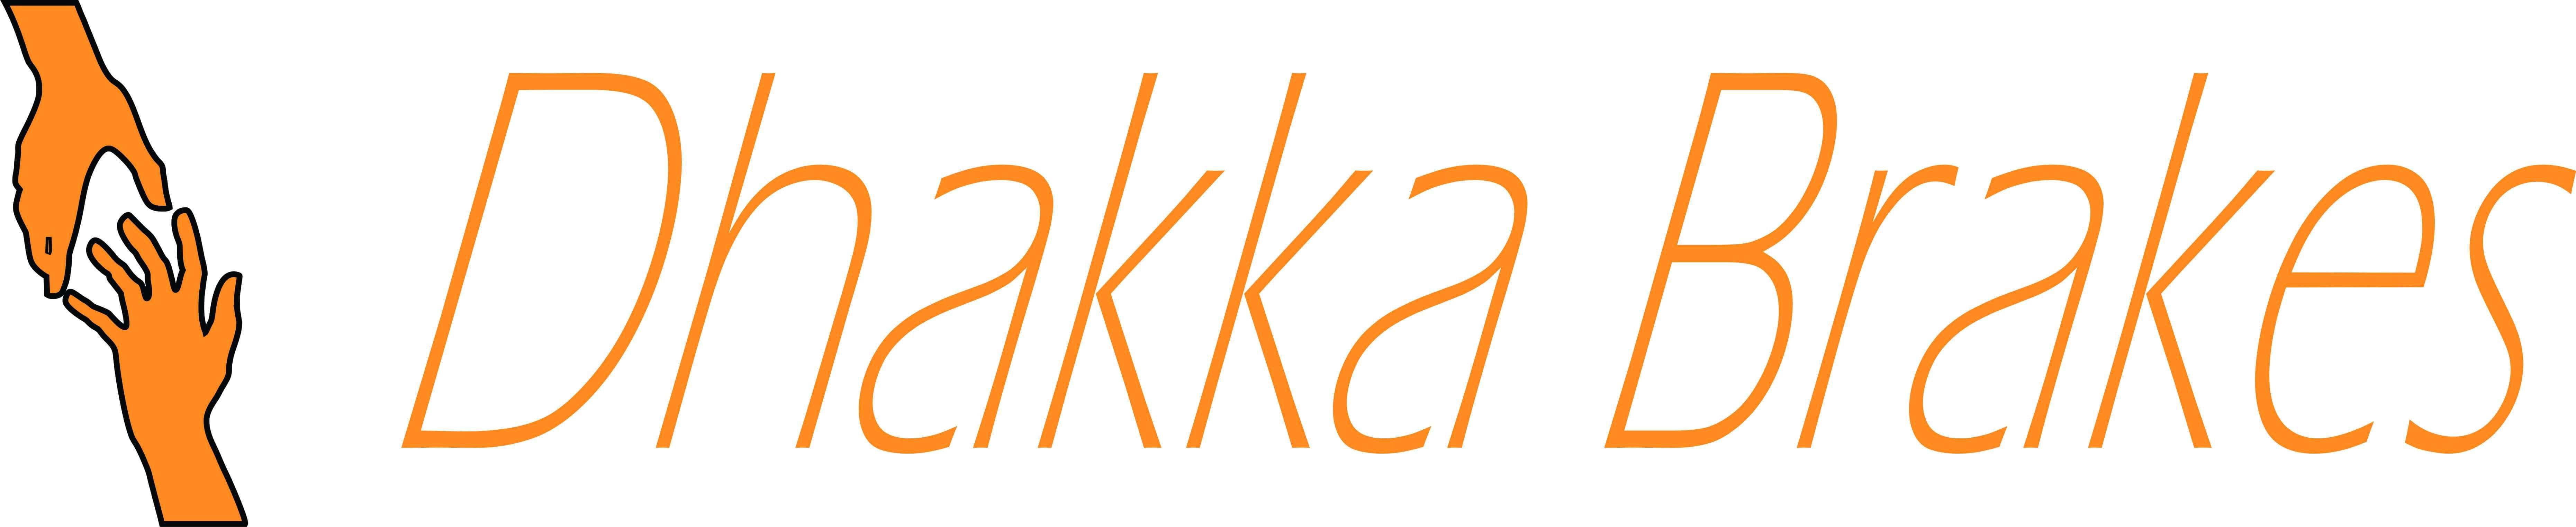 Dhakka Brakes